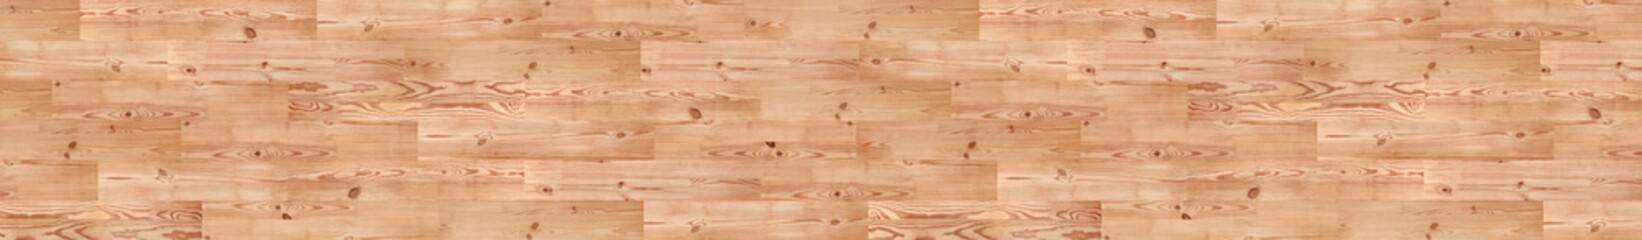 Obraz Wood floor texture. Wooden parquet. Flooring. Natural wooden background. - fototapety do salonu